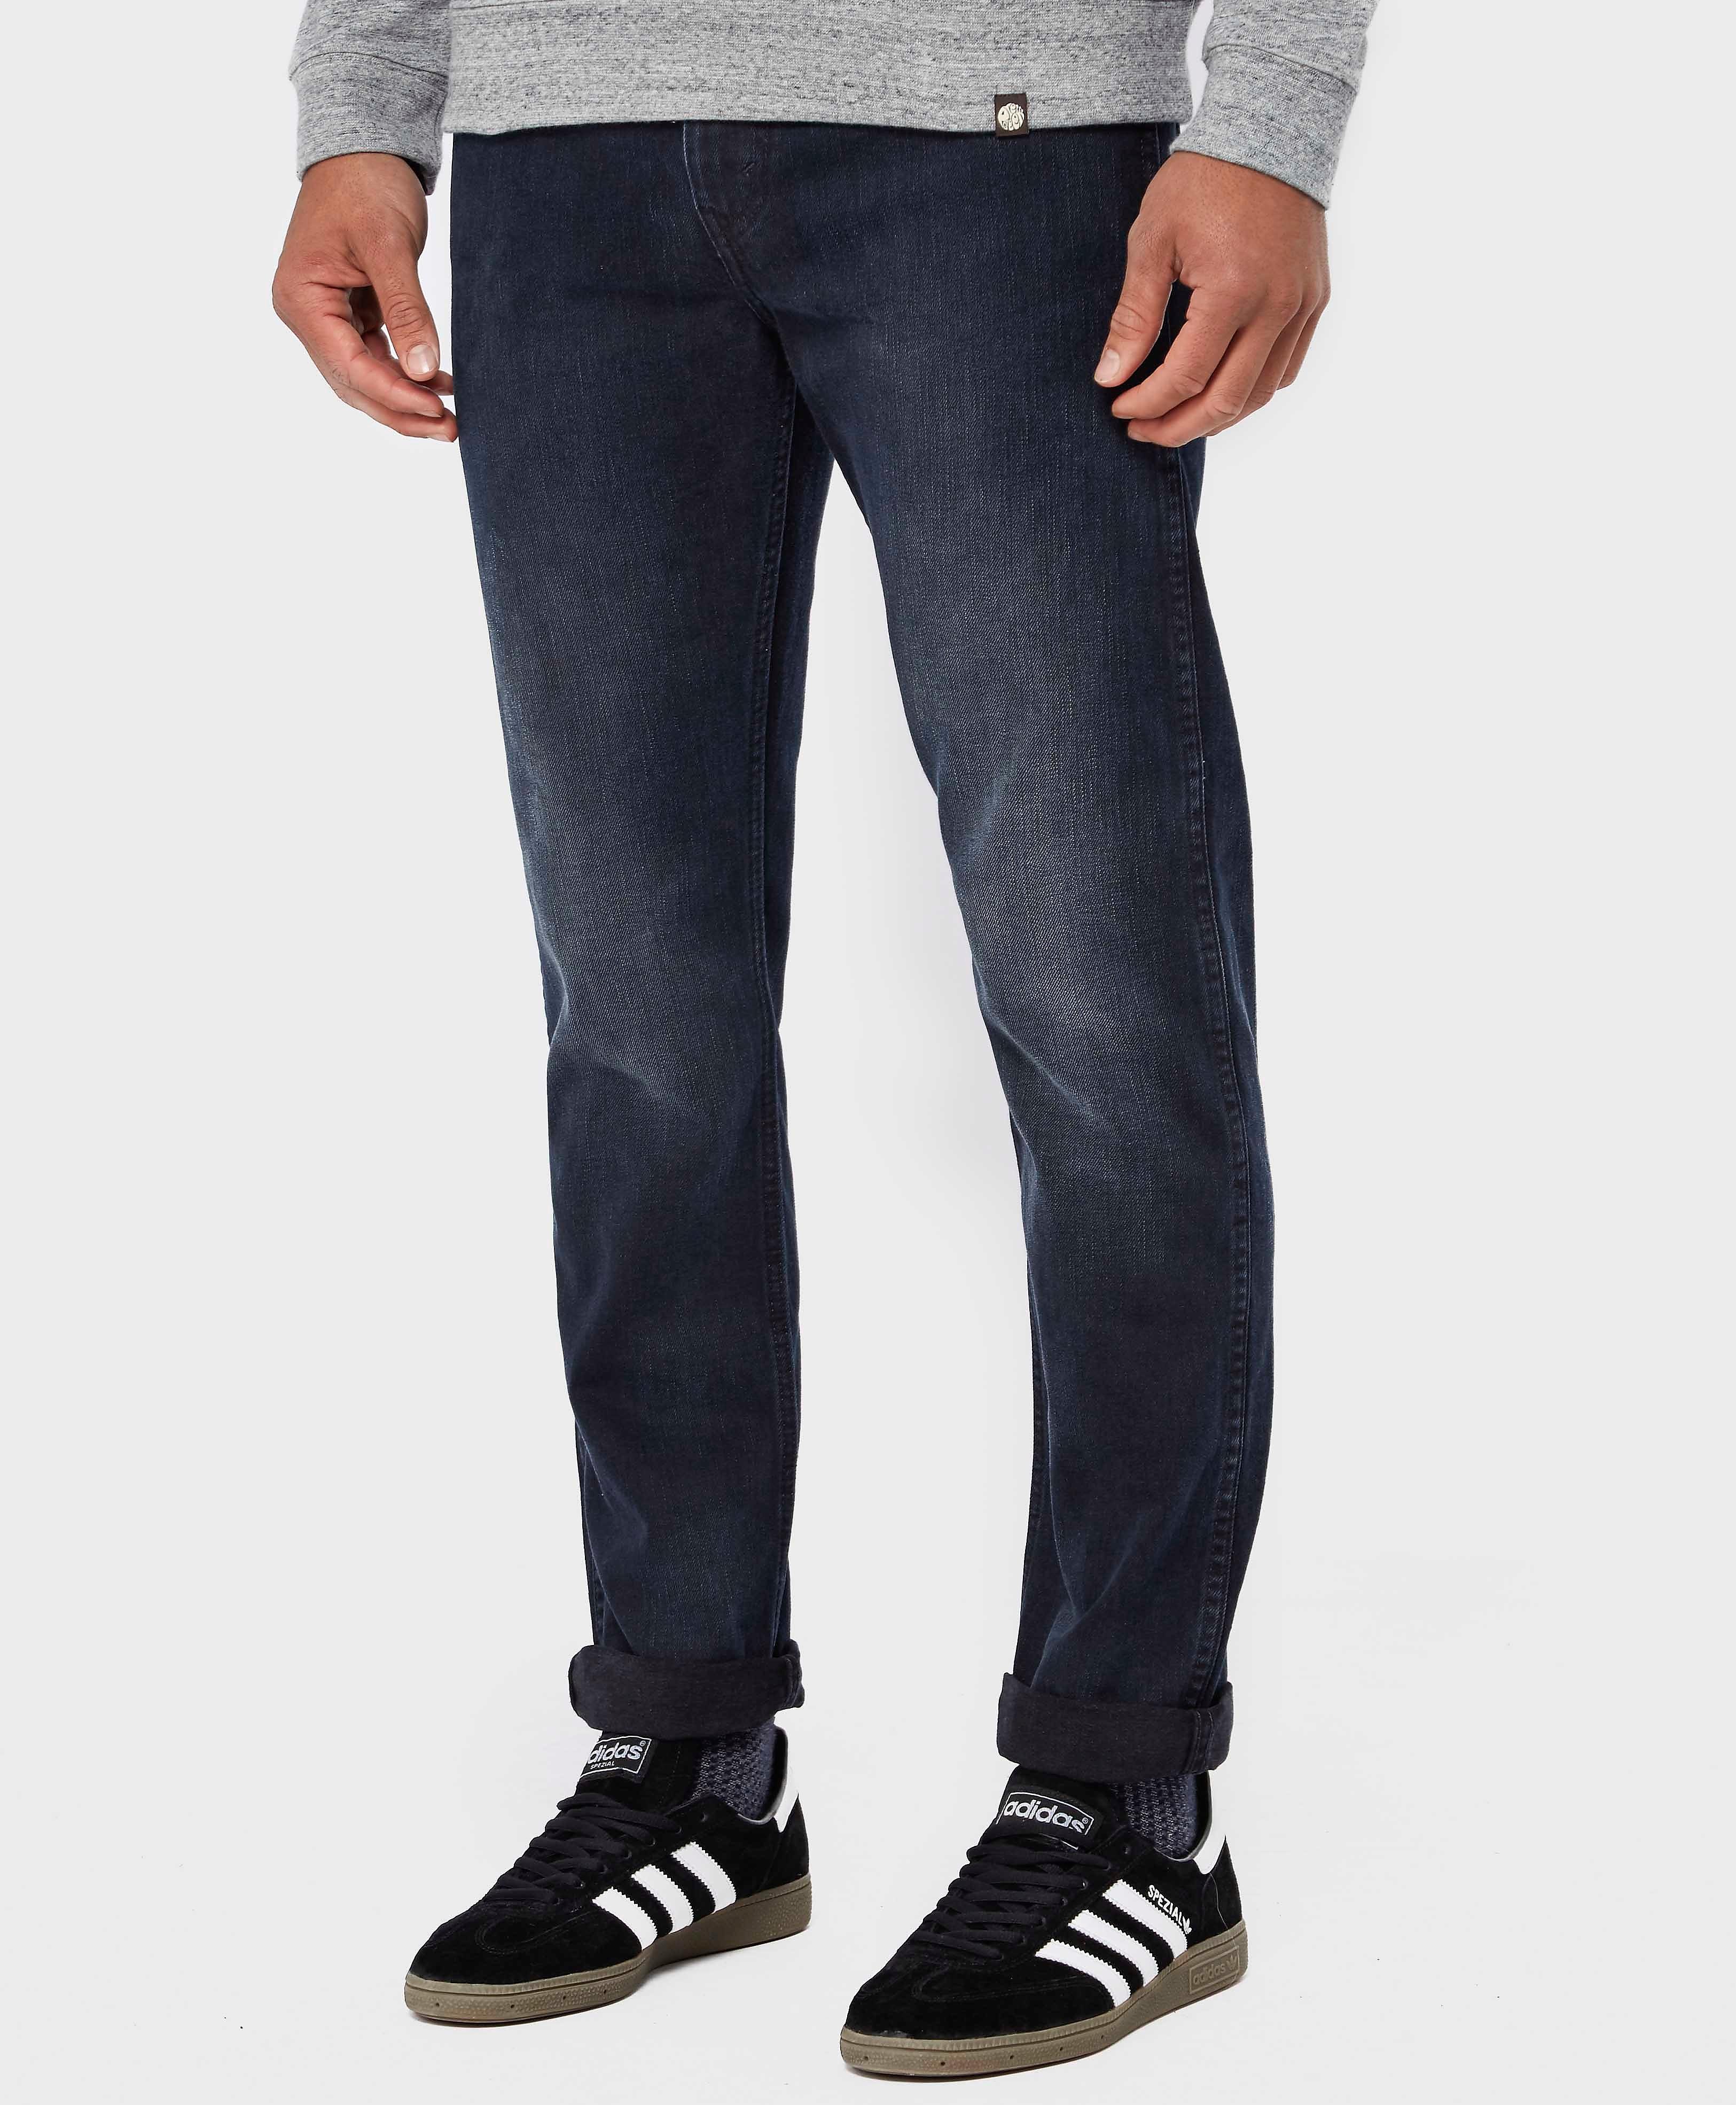 Levis 522 Taper Jeans